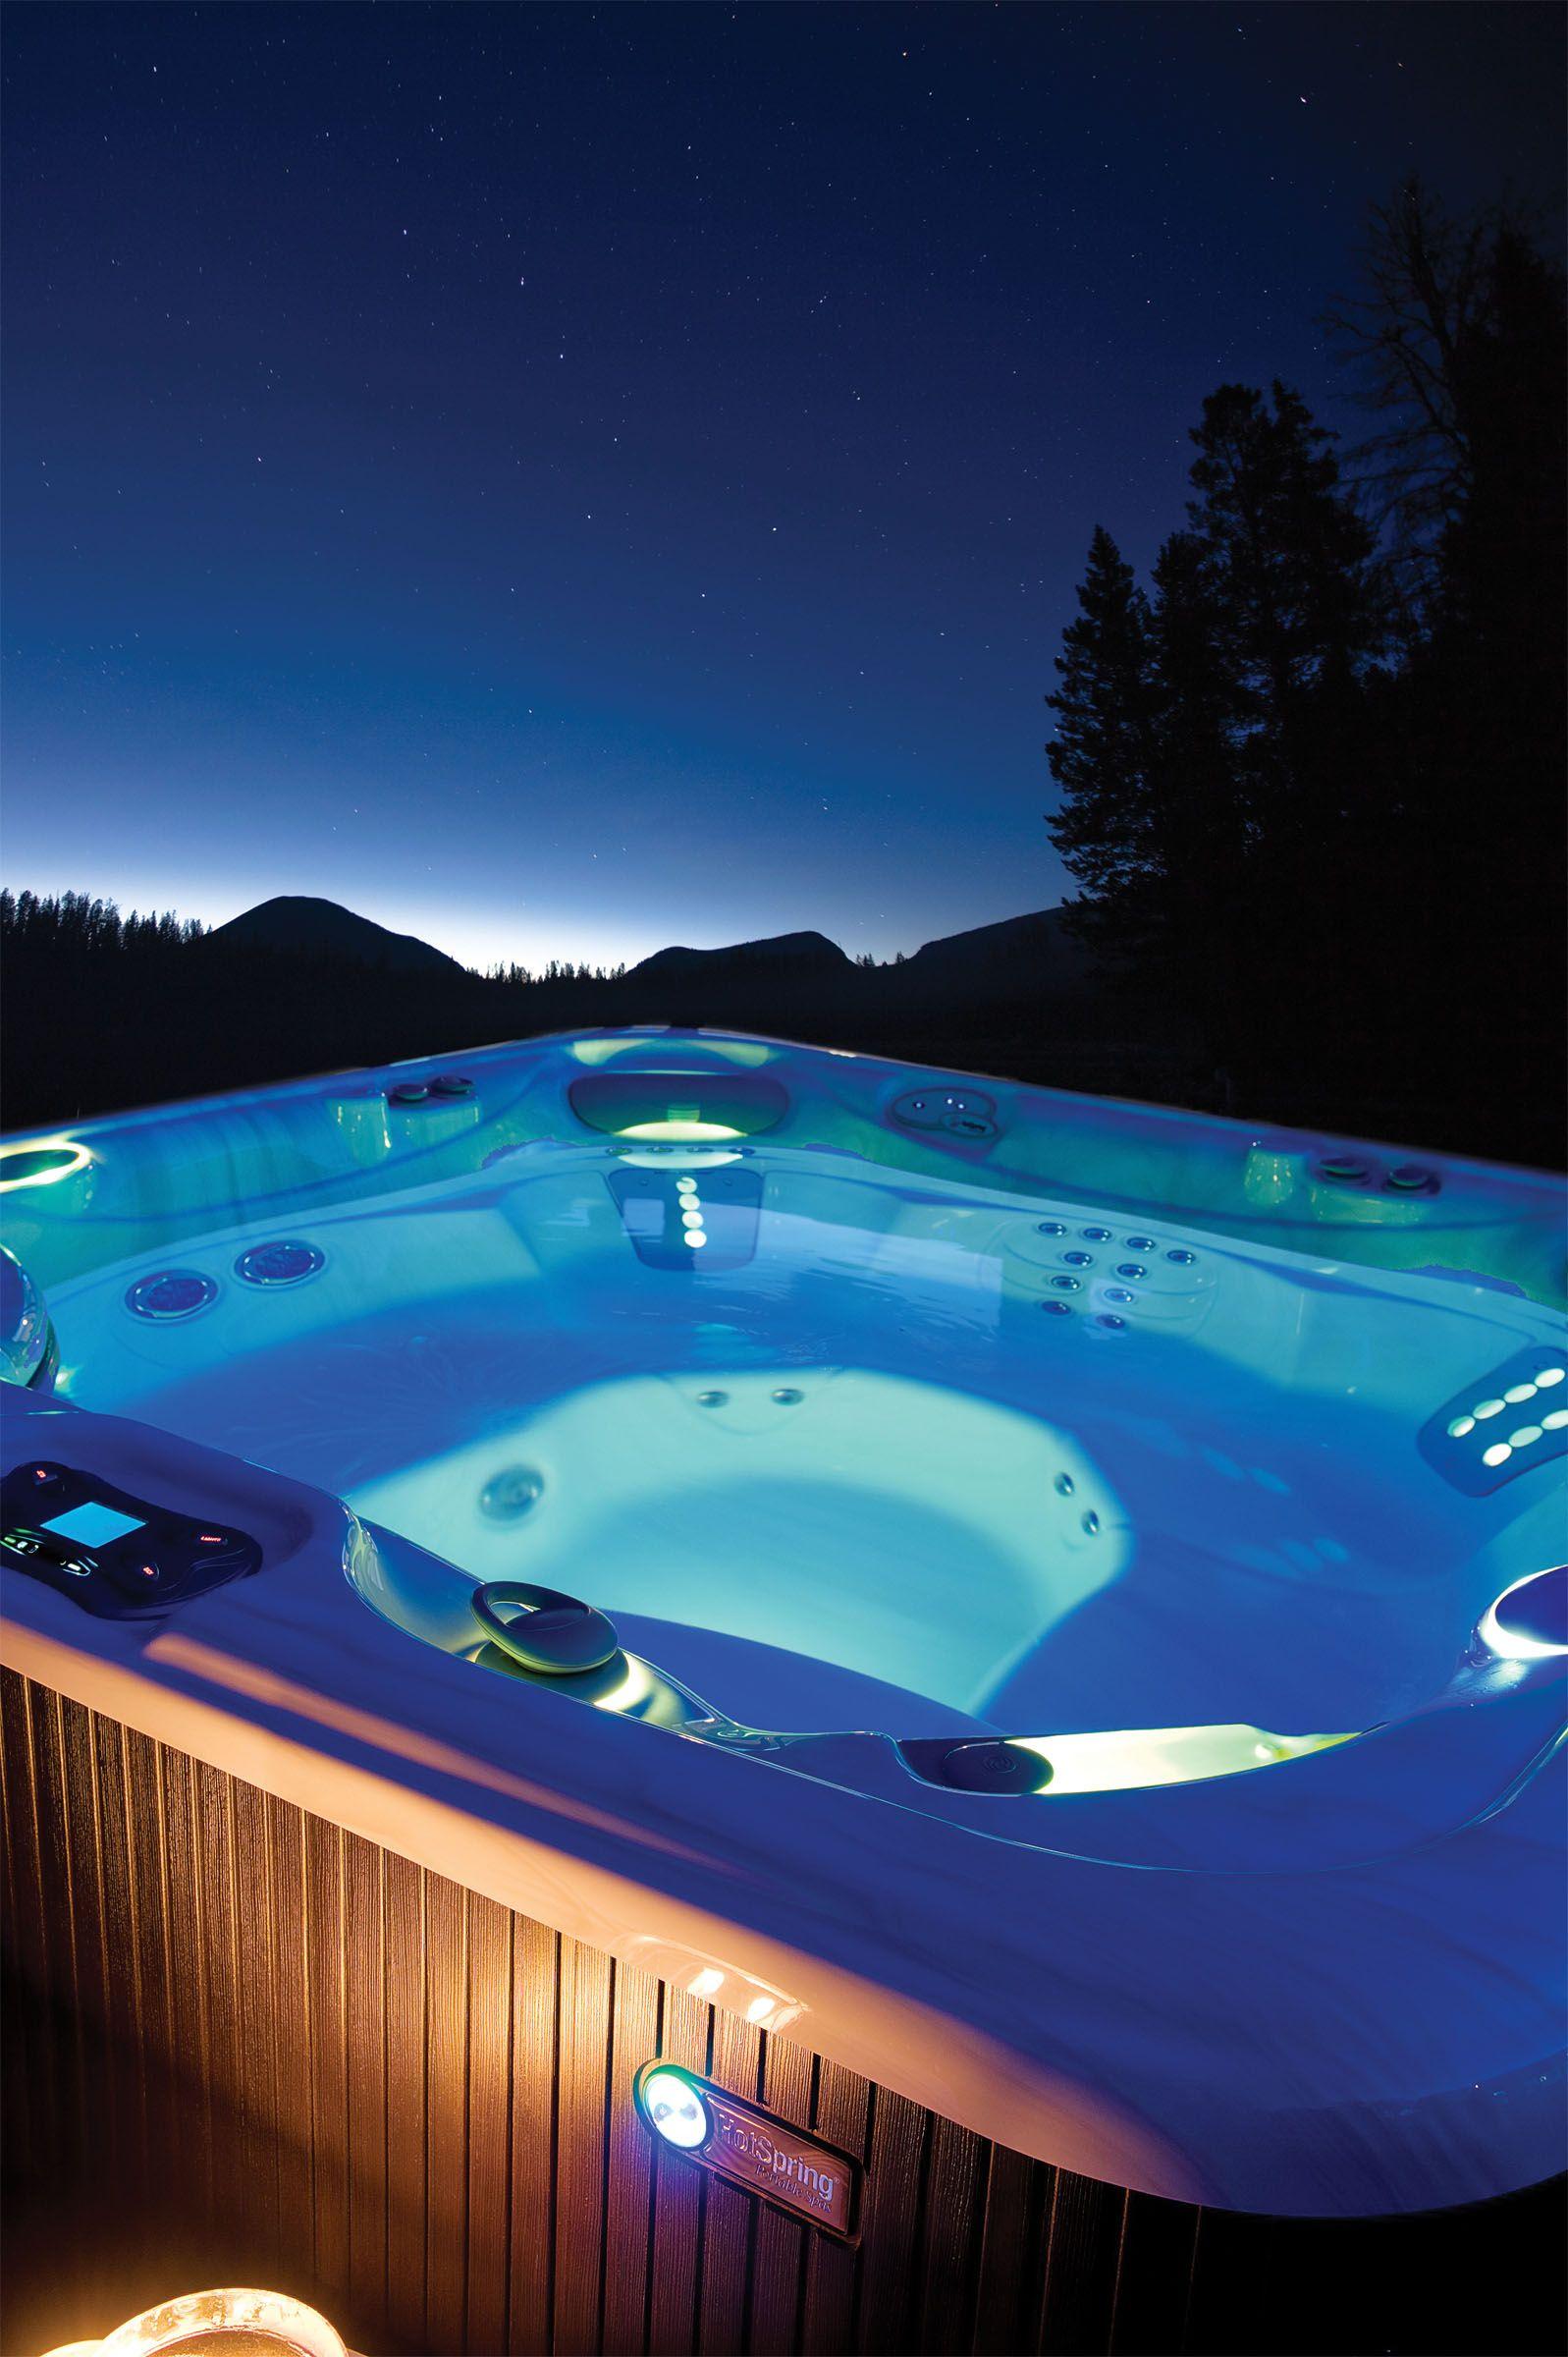 Hot Tub Led Lighting Systems Hot Tub Hot Tub Brands Spa Hot Tubs